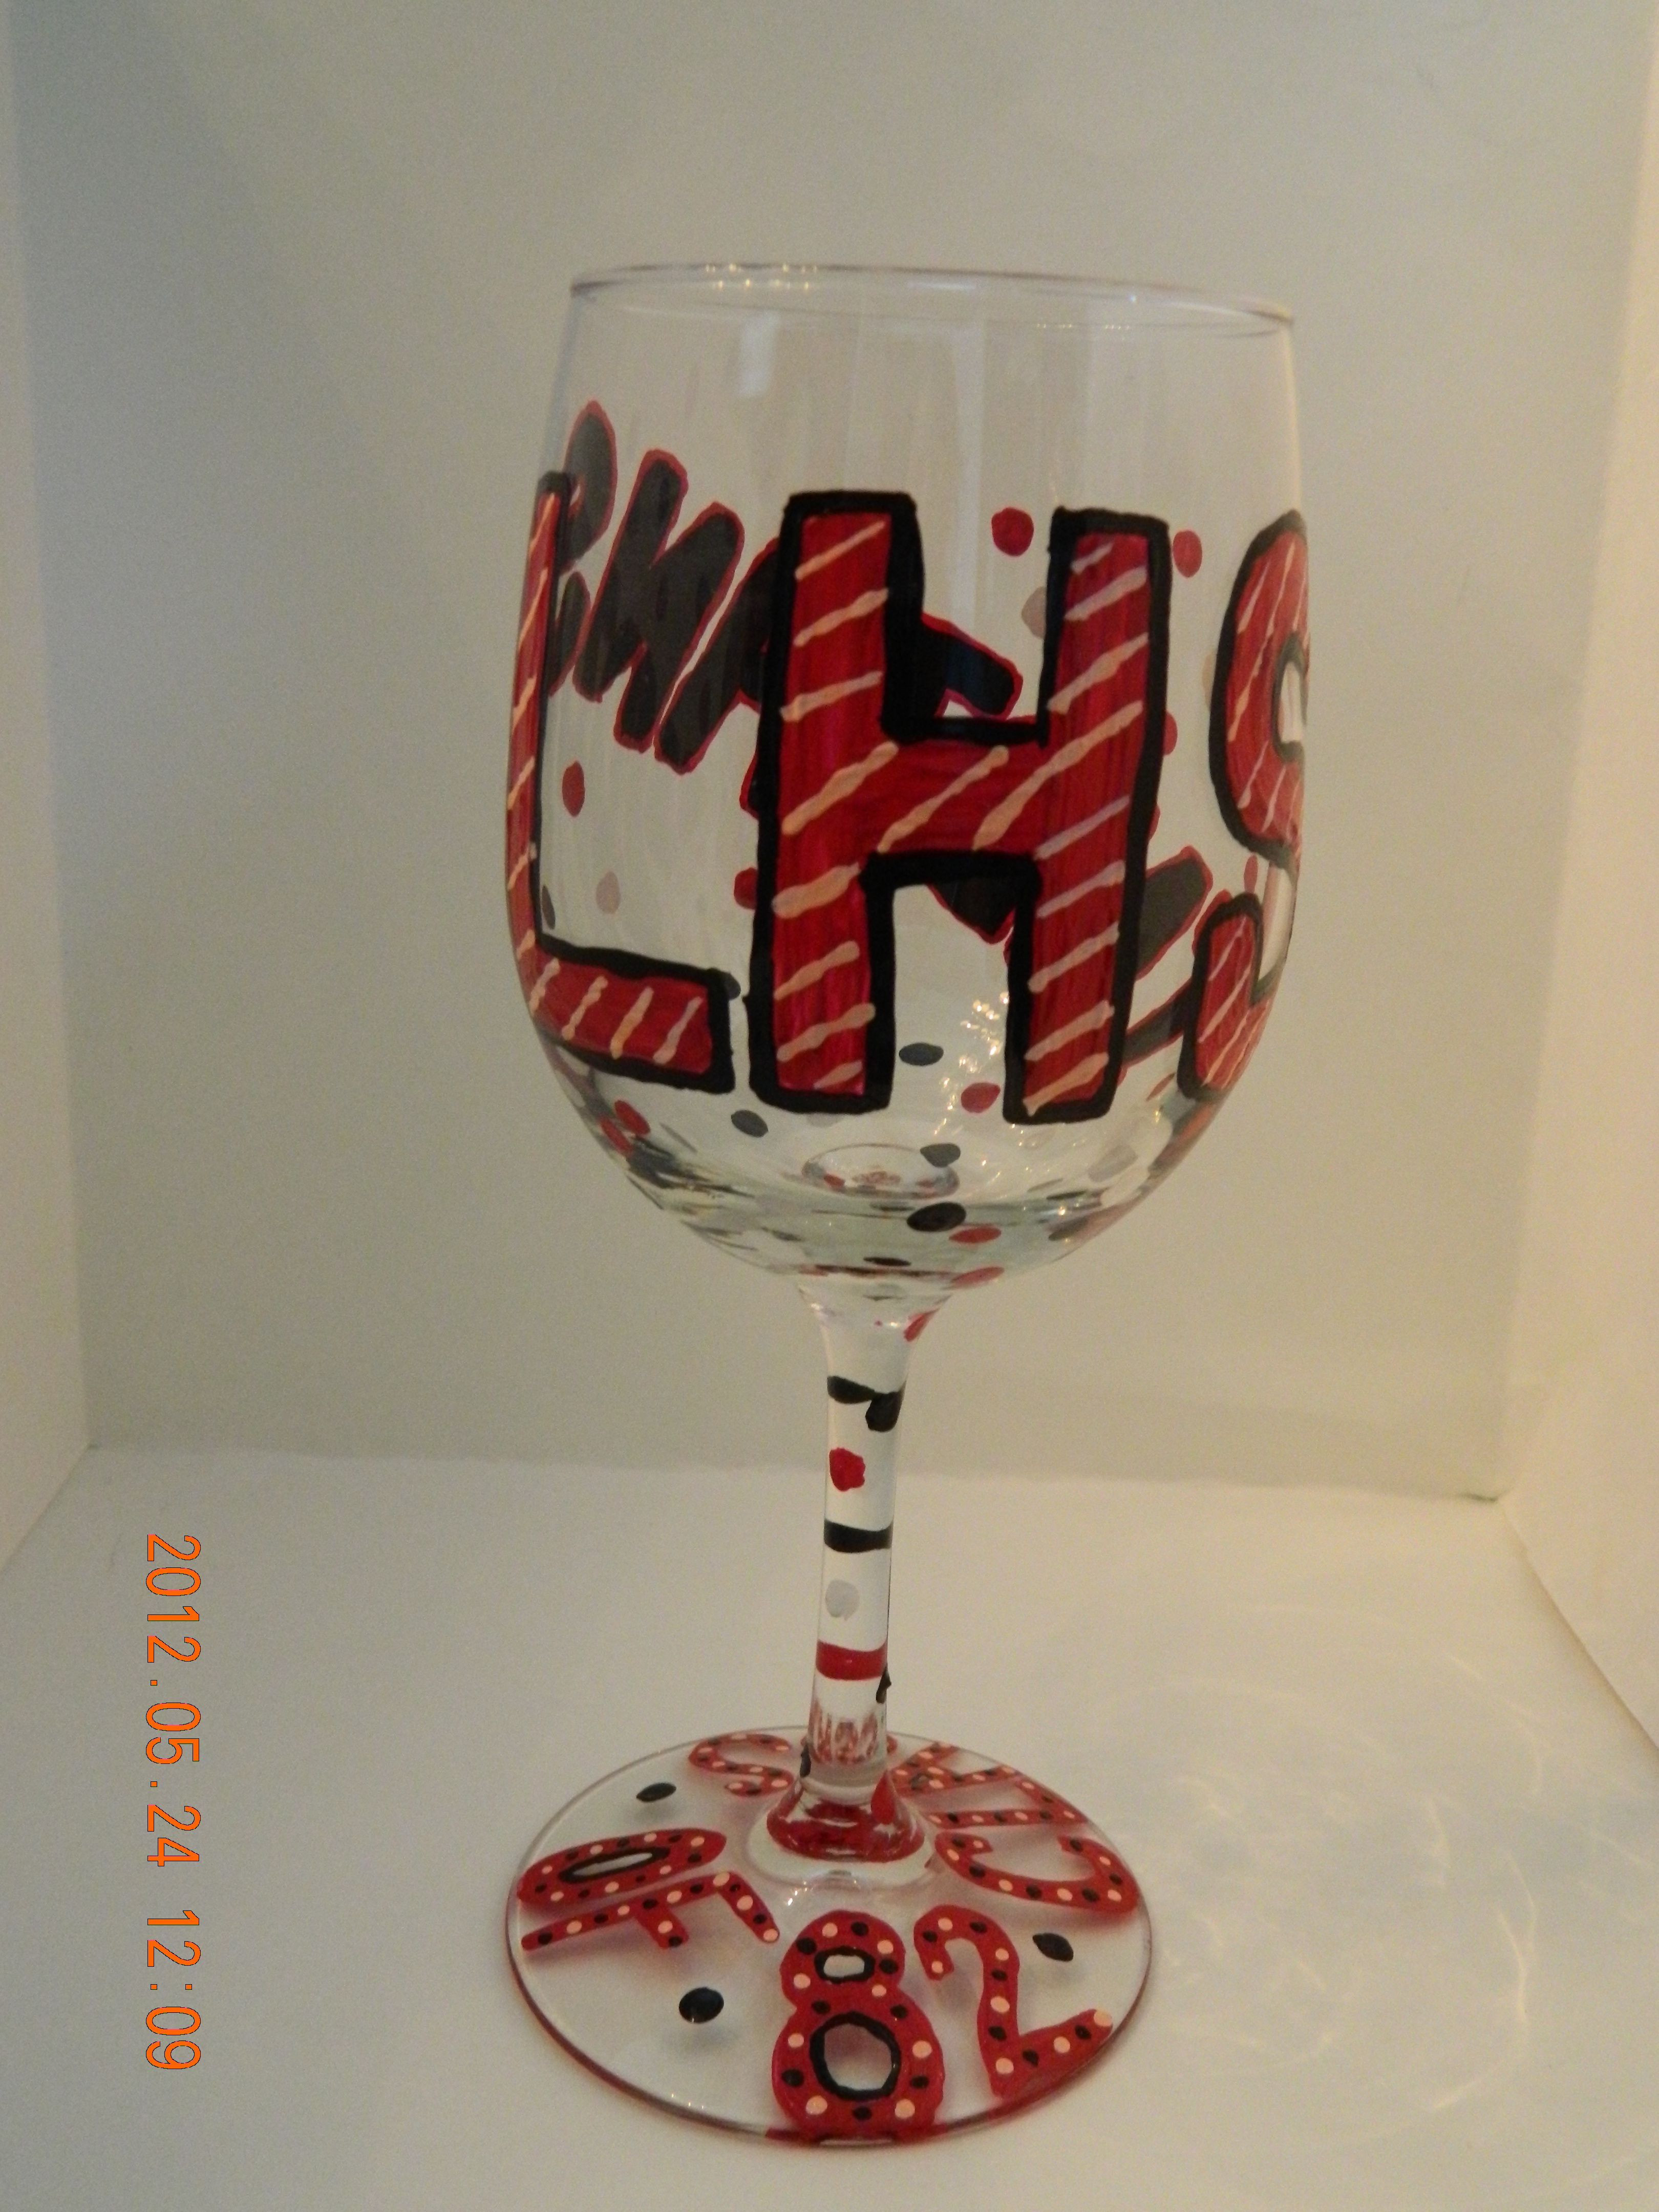 Custom Hand Painted Wine Glasses Schoolspiritbling Com Or School Spirit Bling On Facebook Hand Painted Wine Glasses Custom Hand Painted Painted Wine Glasses